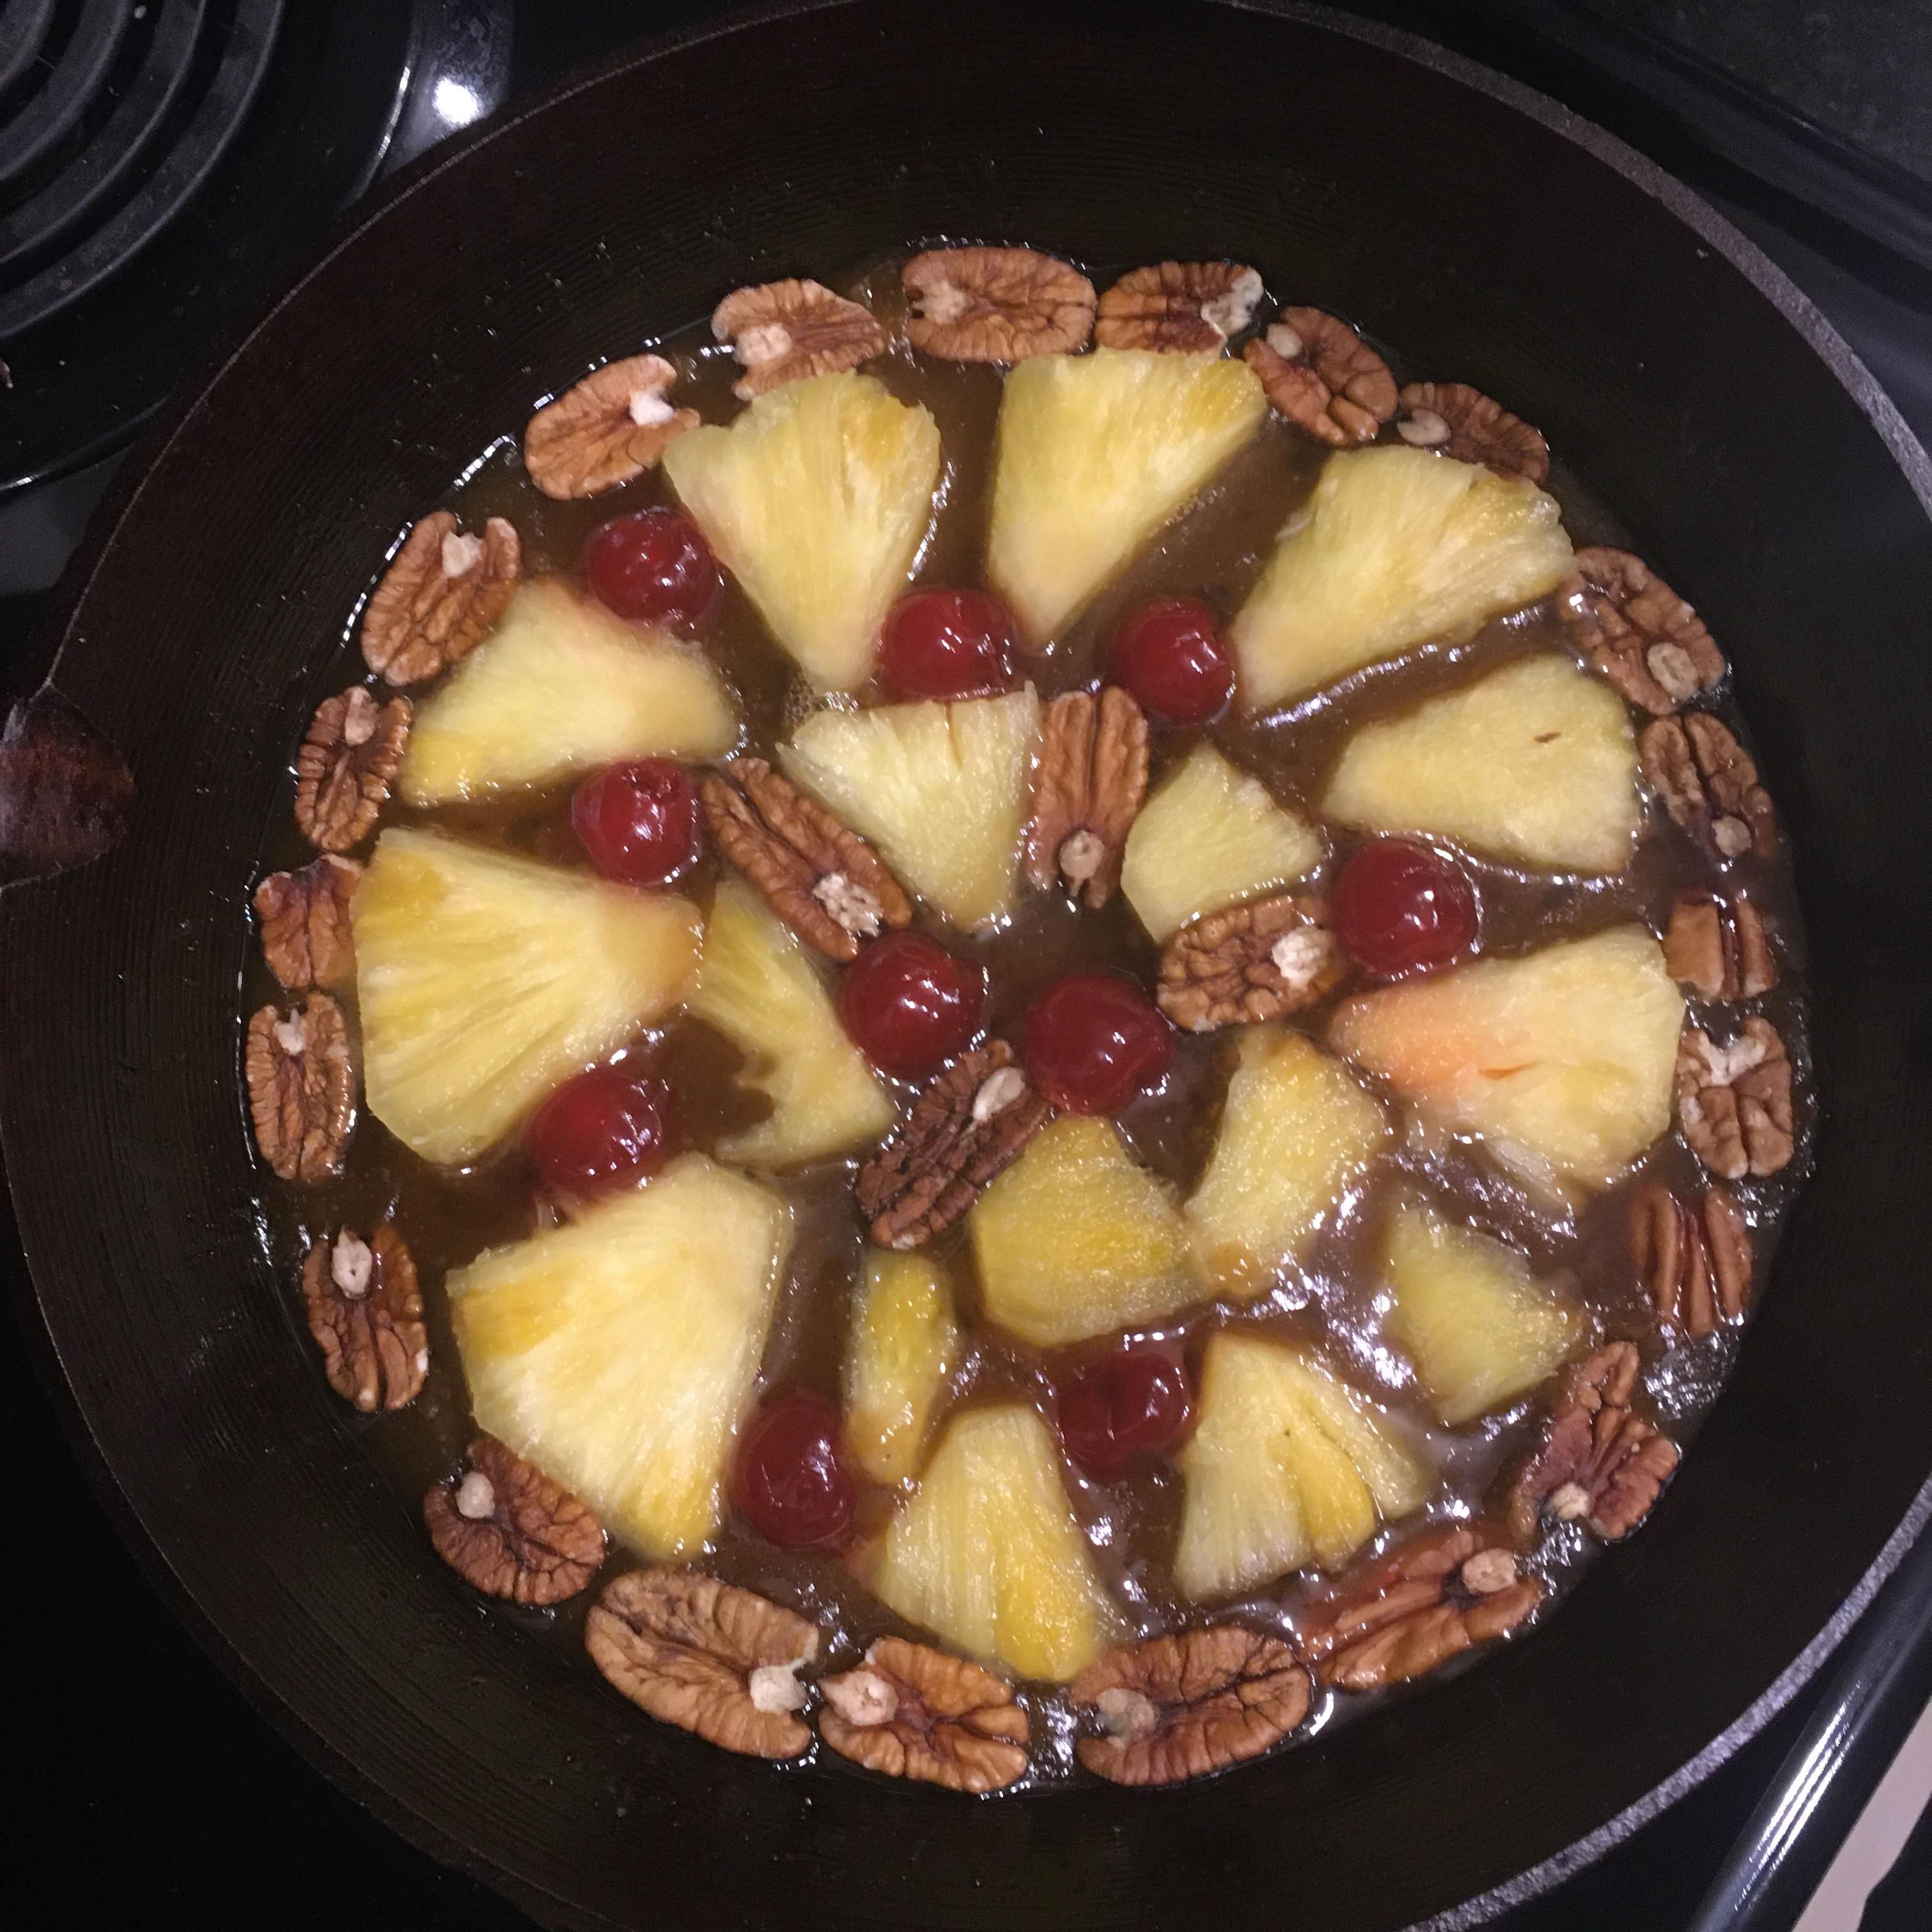 Grandma's Pineapple Upside-Down Cake